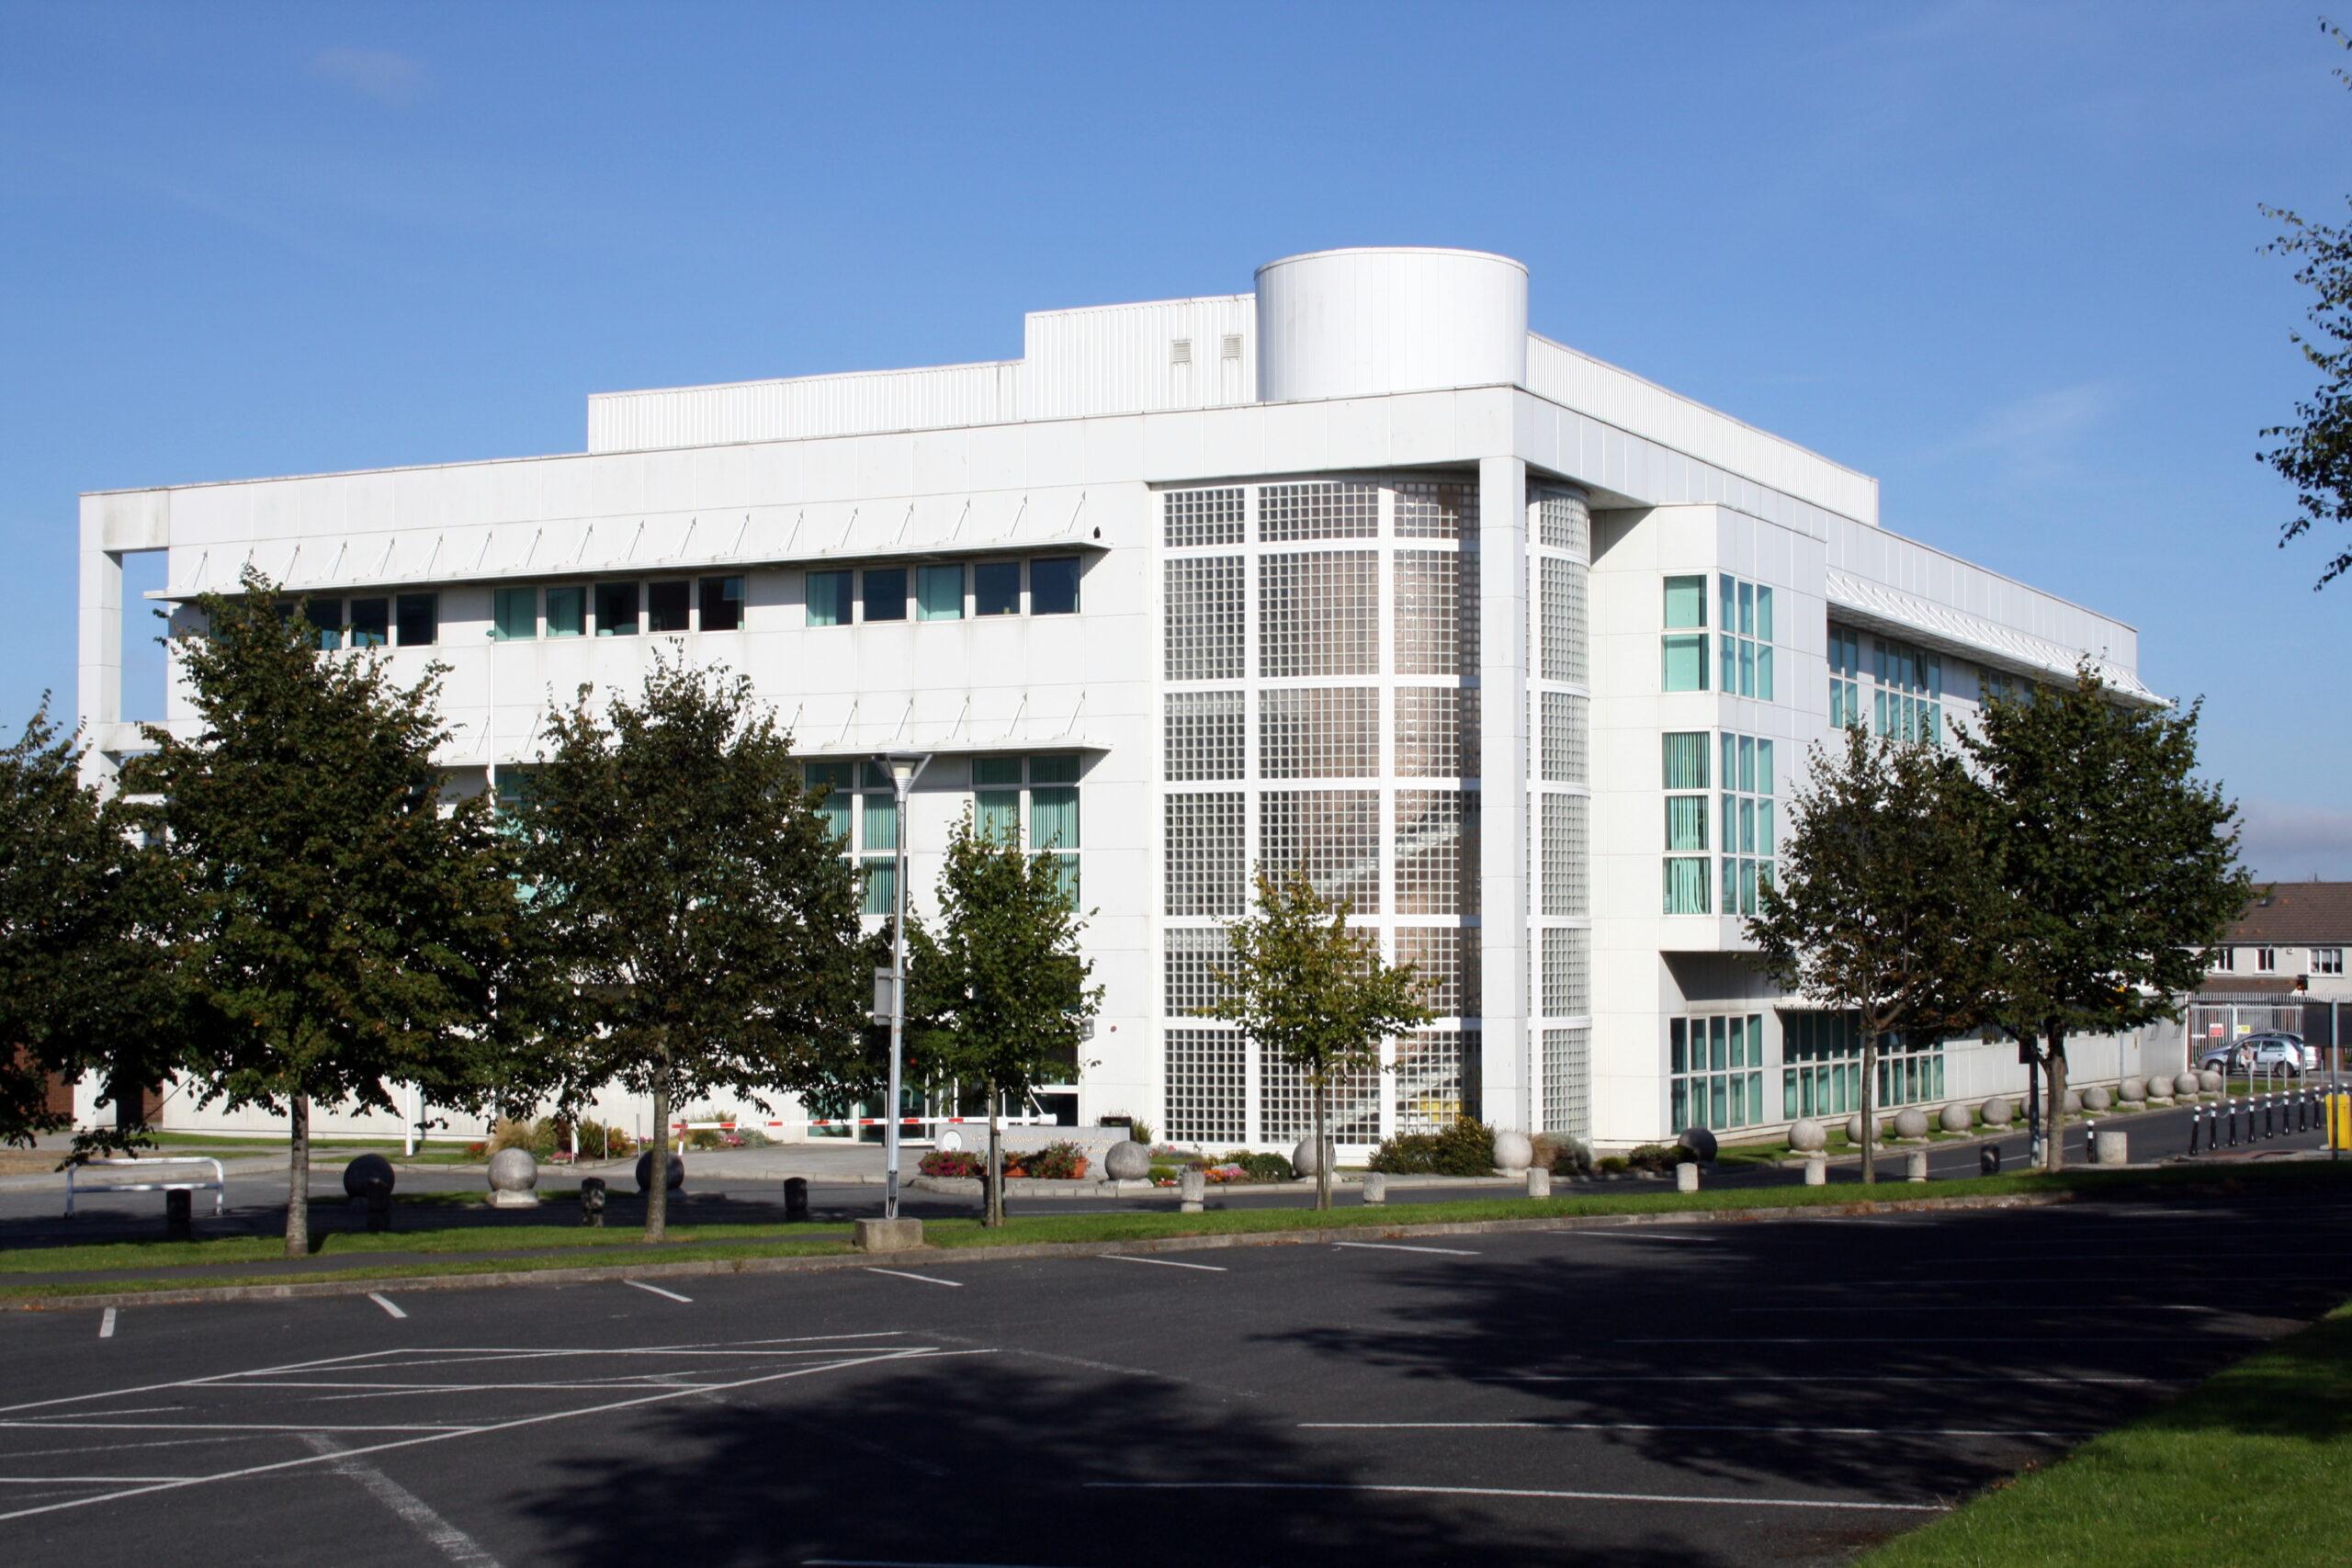 R.C.S.I Disease Research Center Beaumont